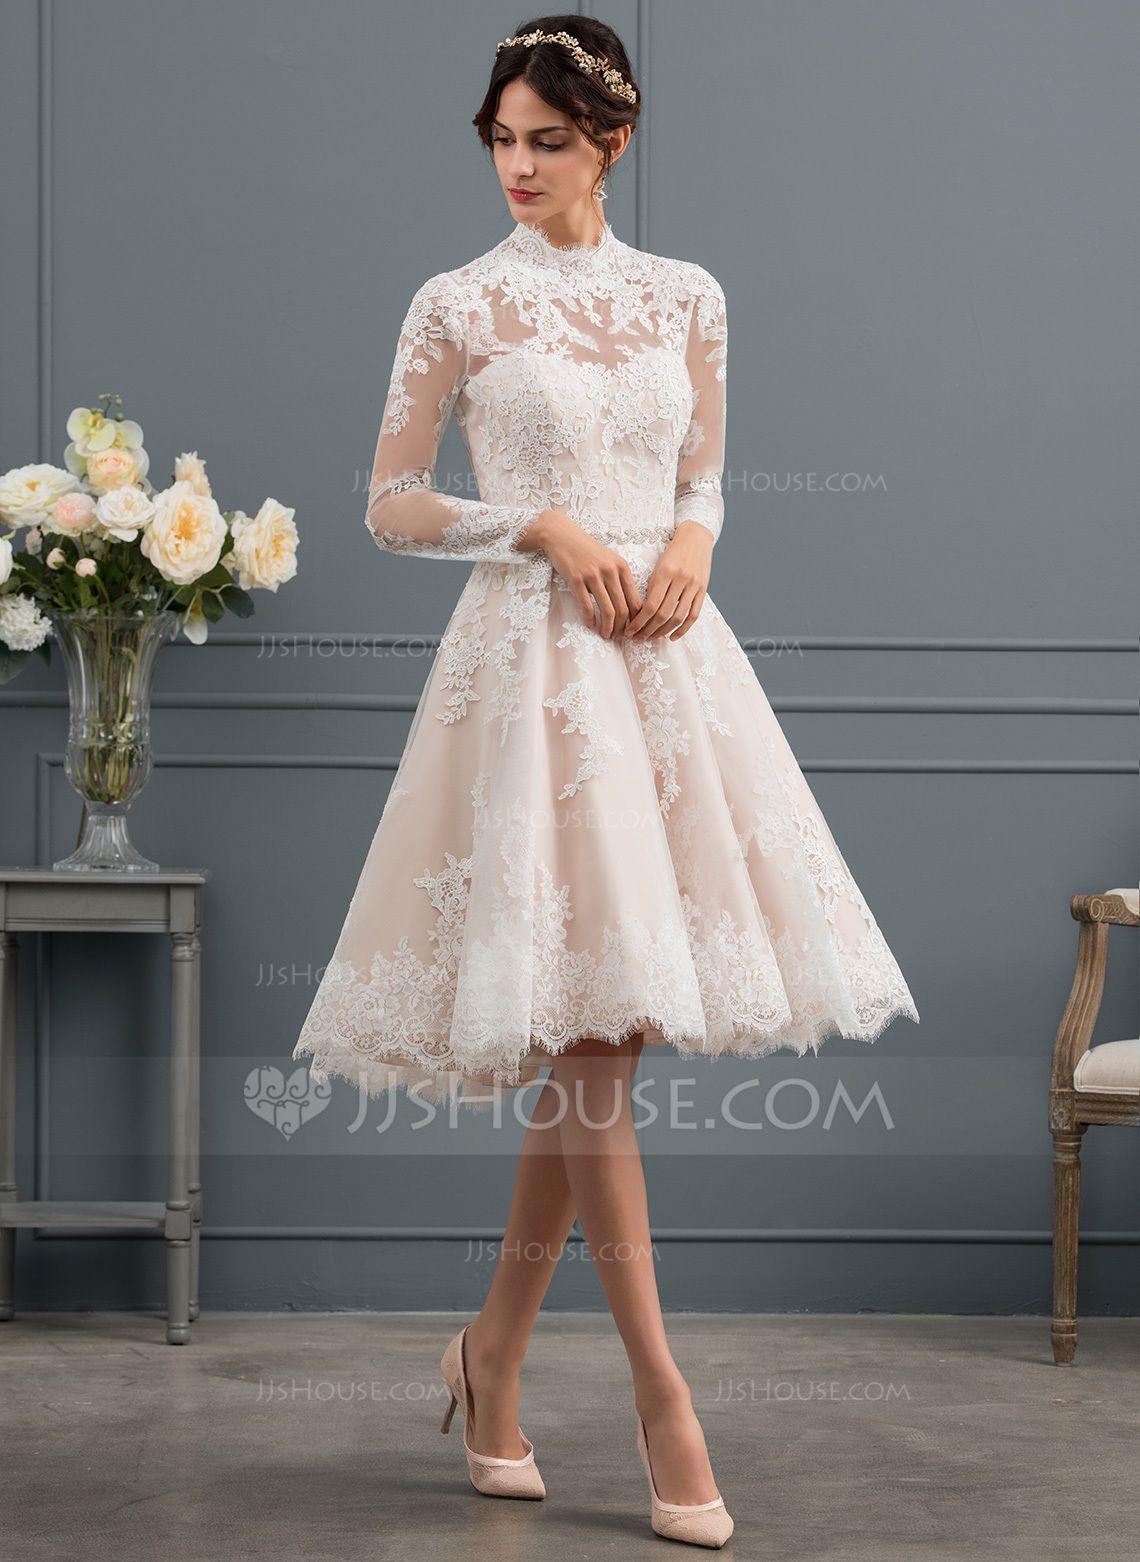 Us 233 00 A Line Illusion Knee Length Lace Wedding Dress Jj S House Tea Length Wedding Dresses Lace Short Wedding Dress Wedding Dresses Lace [ 1562 x 1140 Pixel ]